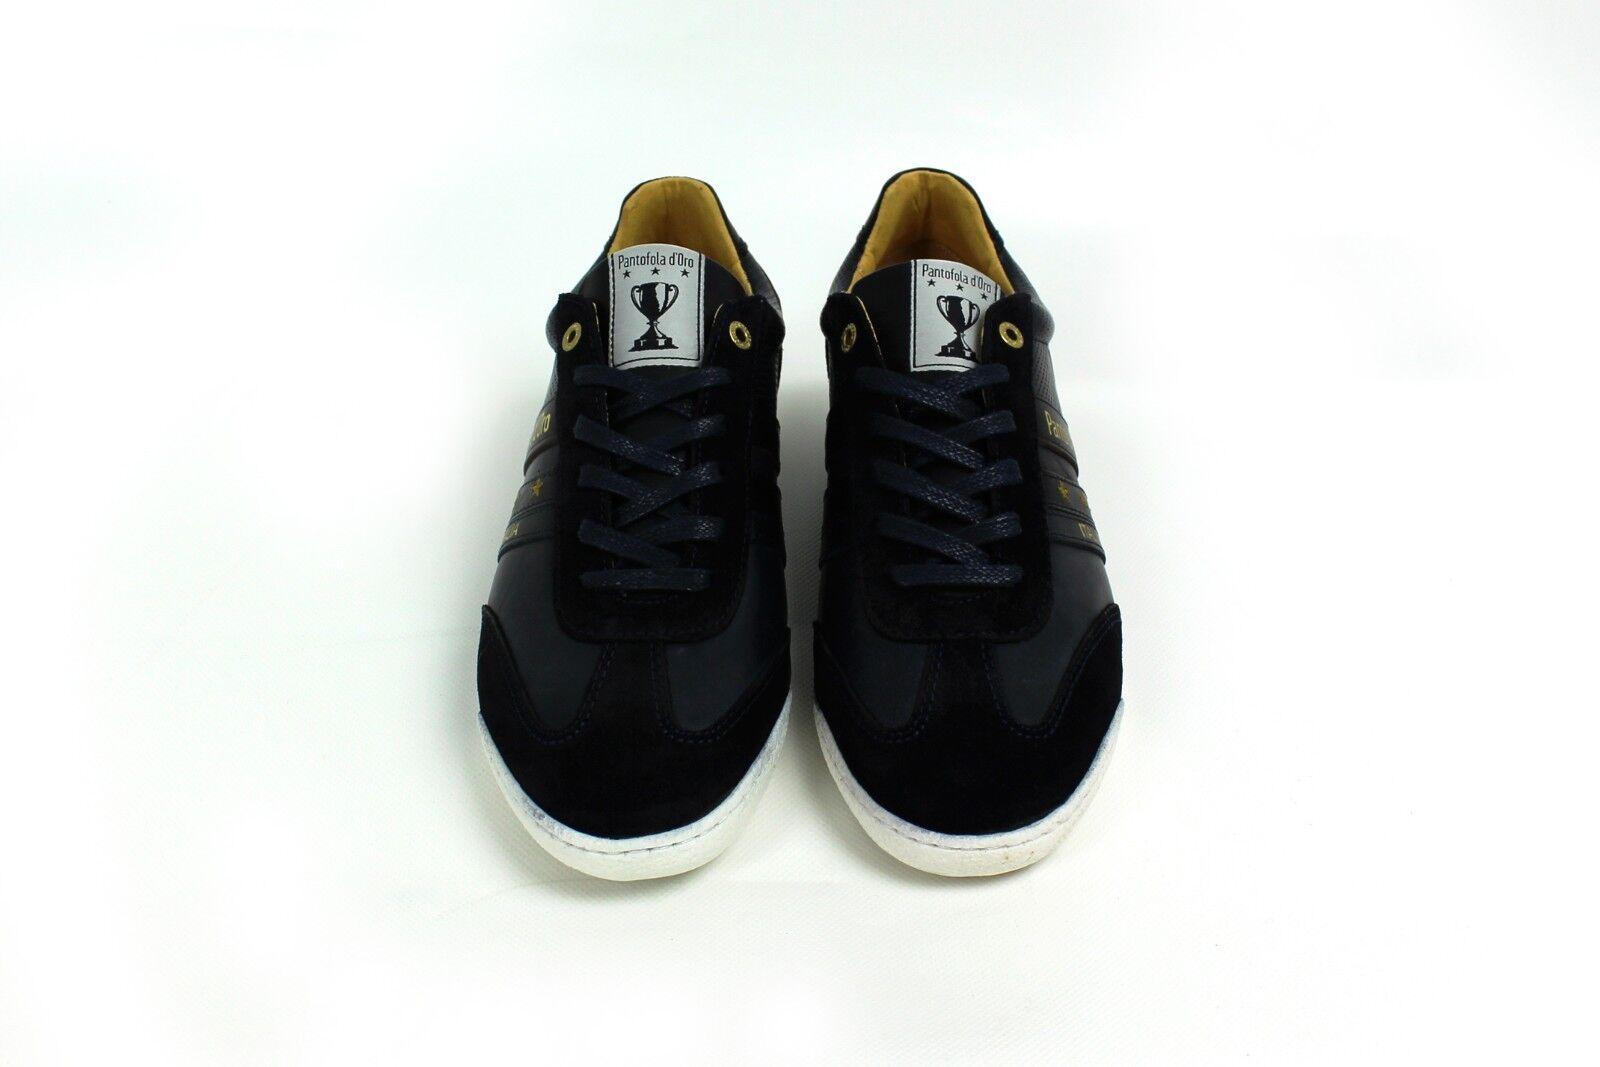 Pantofola d'Oro Herren Vasto Uomo Low Sneaker Blau (Dress Blues) Gr. 41